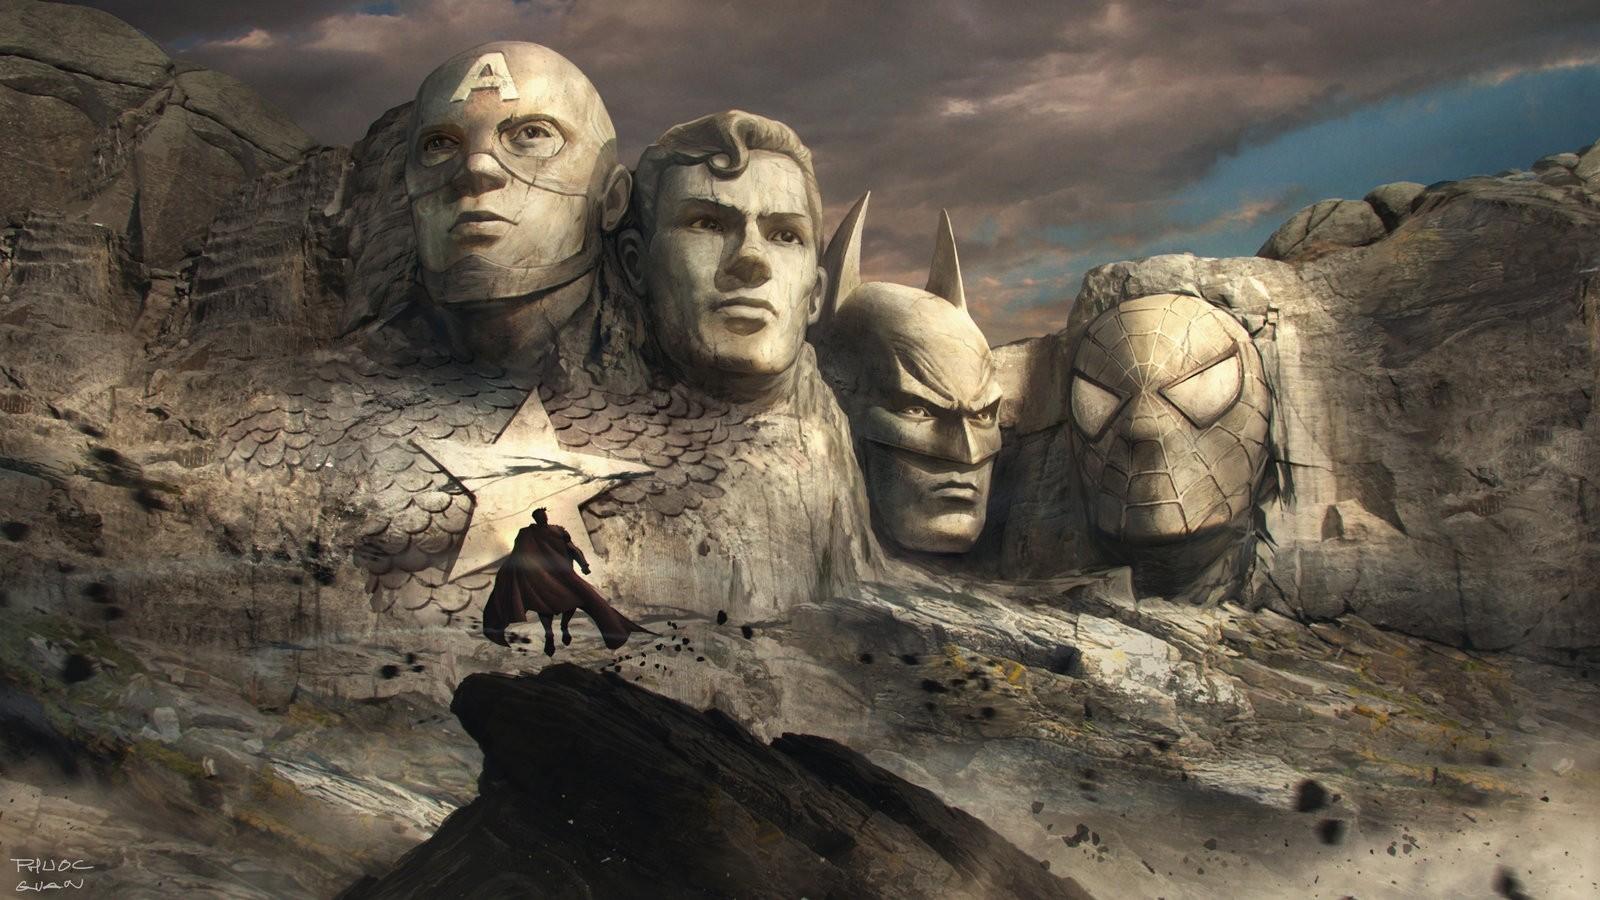 Beautiful Wallpaper Marvel Face - superhero_artwork_mountains_Mount_Rushmore_Superman_Batman_Captain_America_Spider_Man-159097  Trends_479484.jpg!d